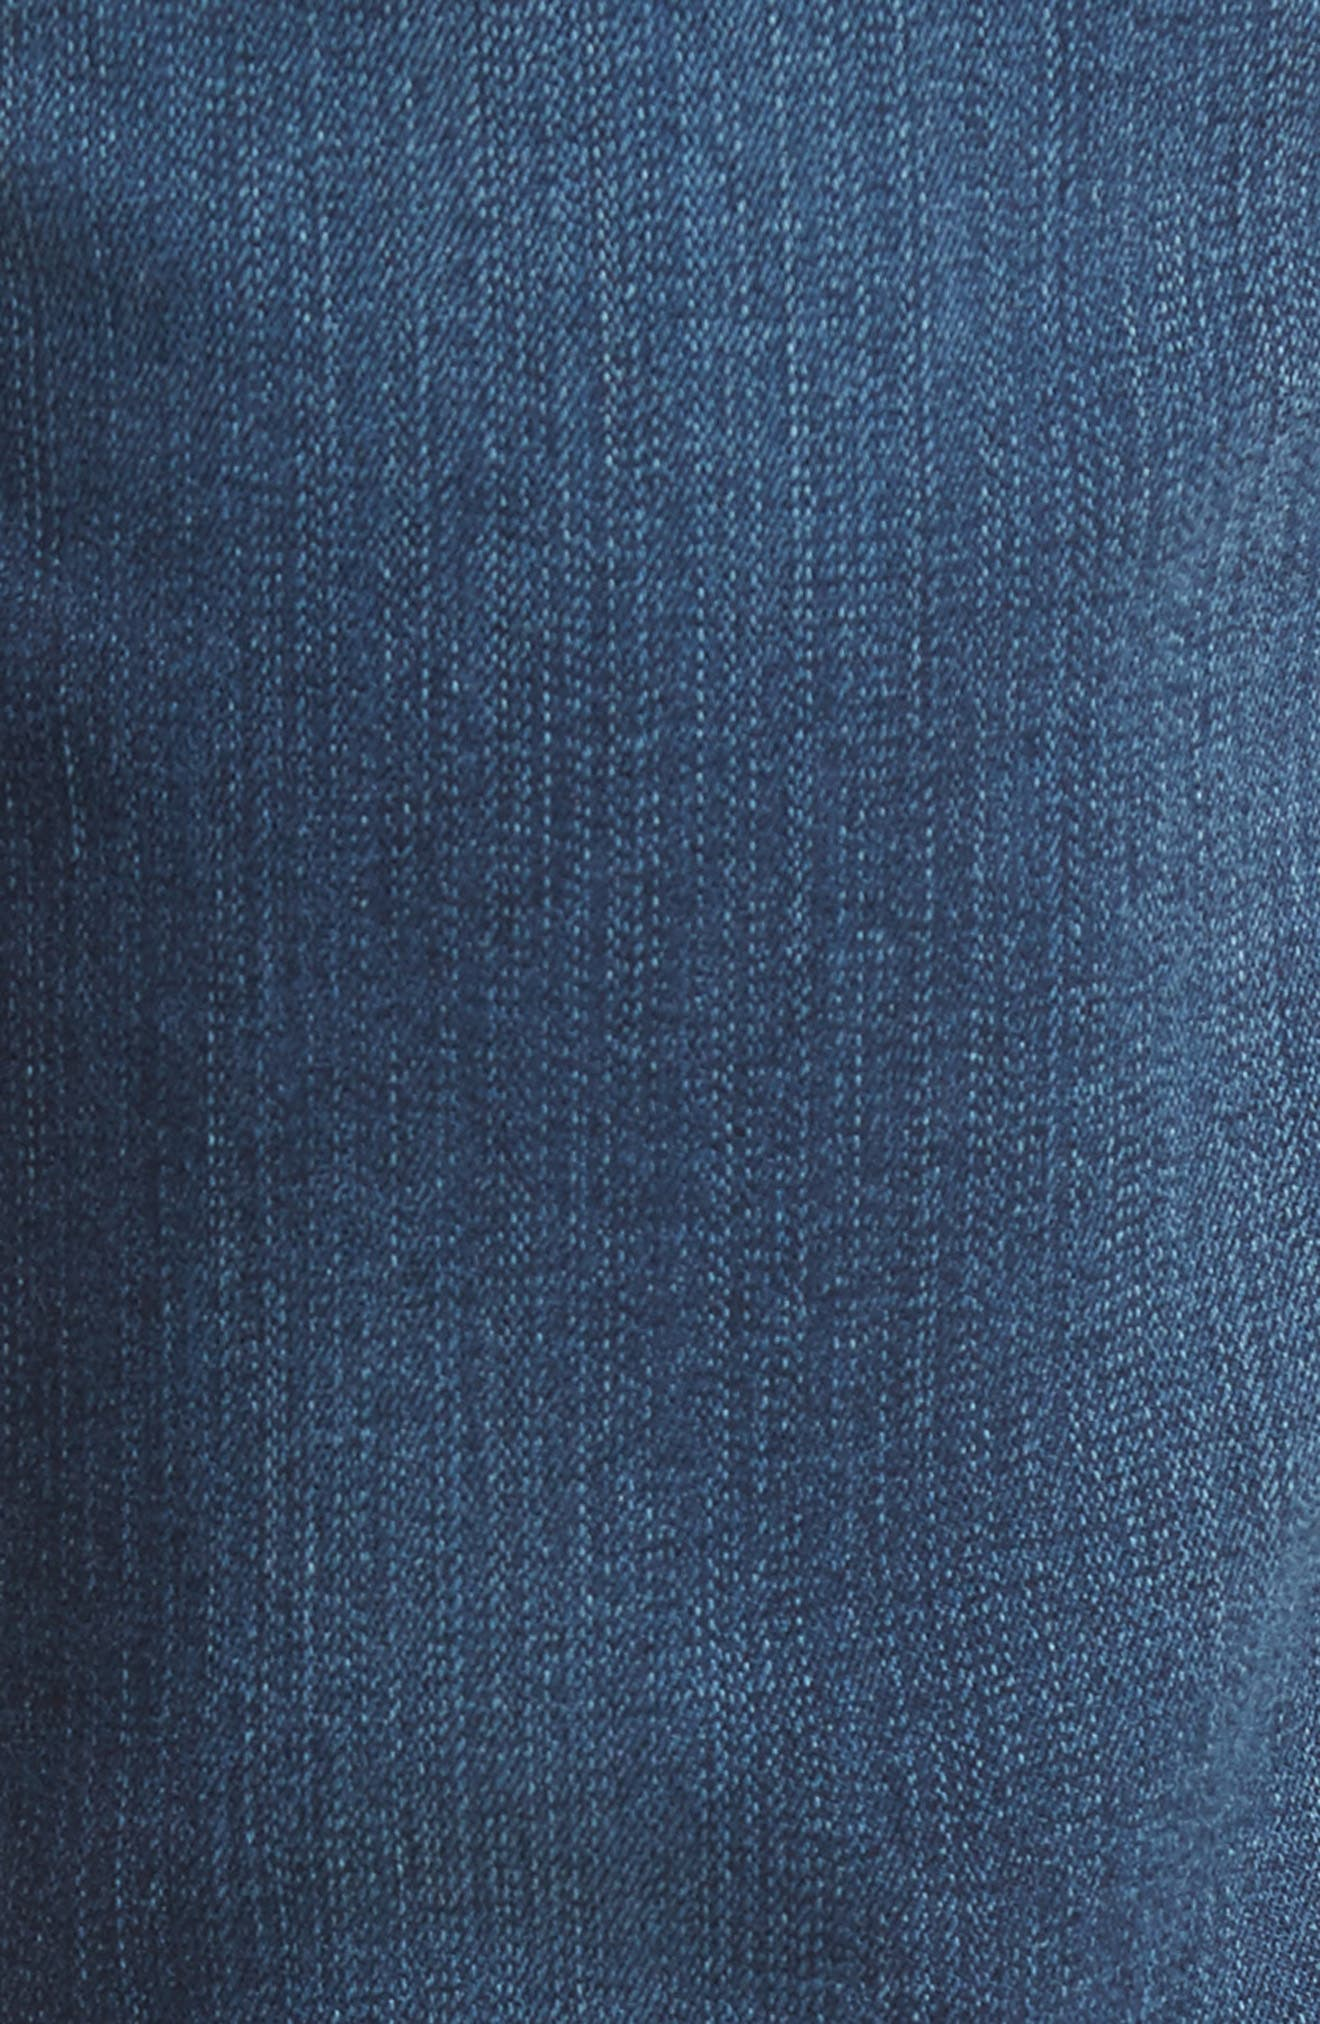 Blake Slim Fit Jeans,                             Alternate thumbnail 5, color,                             Napoleon Blue